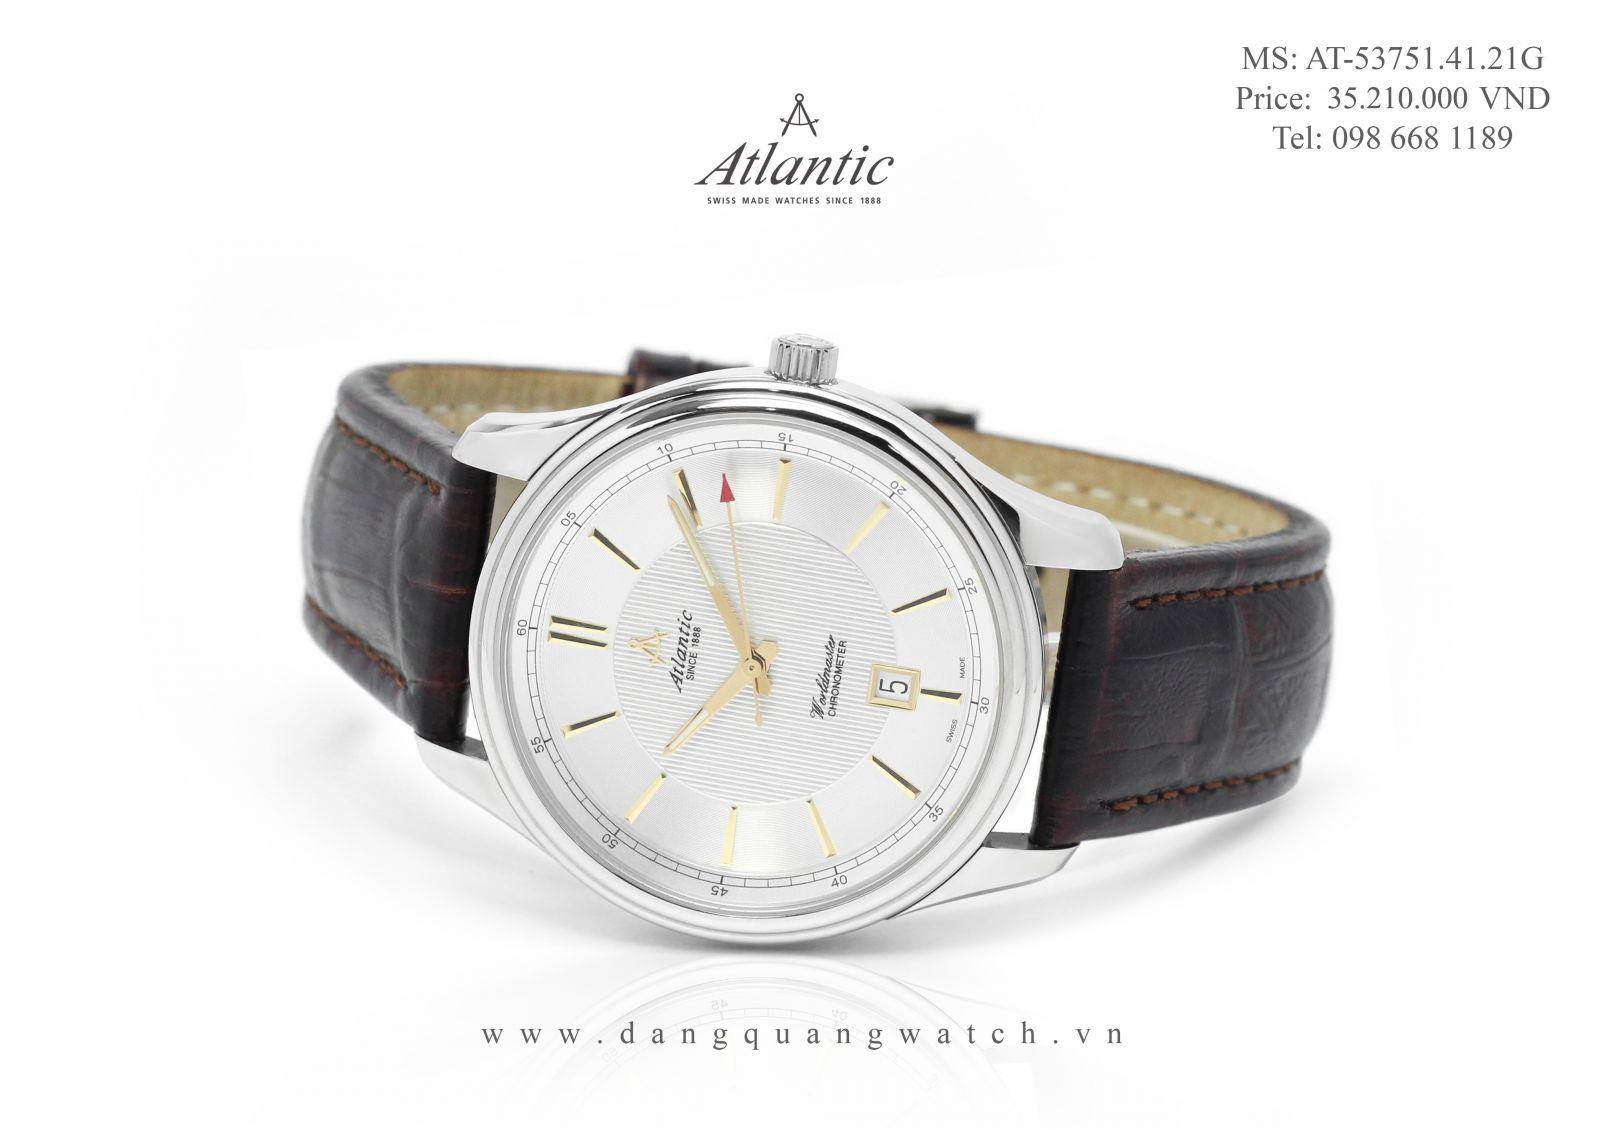 đồng hồ chronometer atlantic